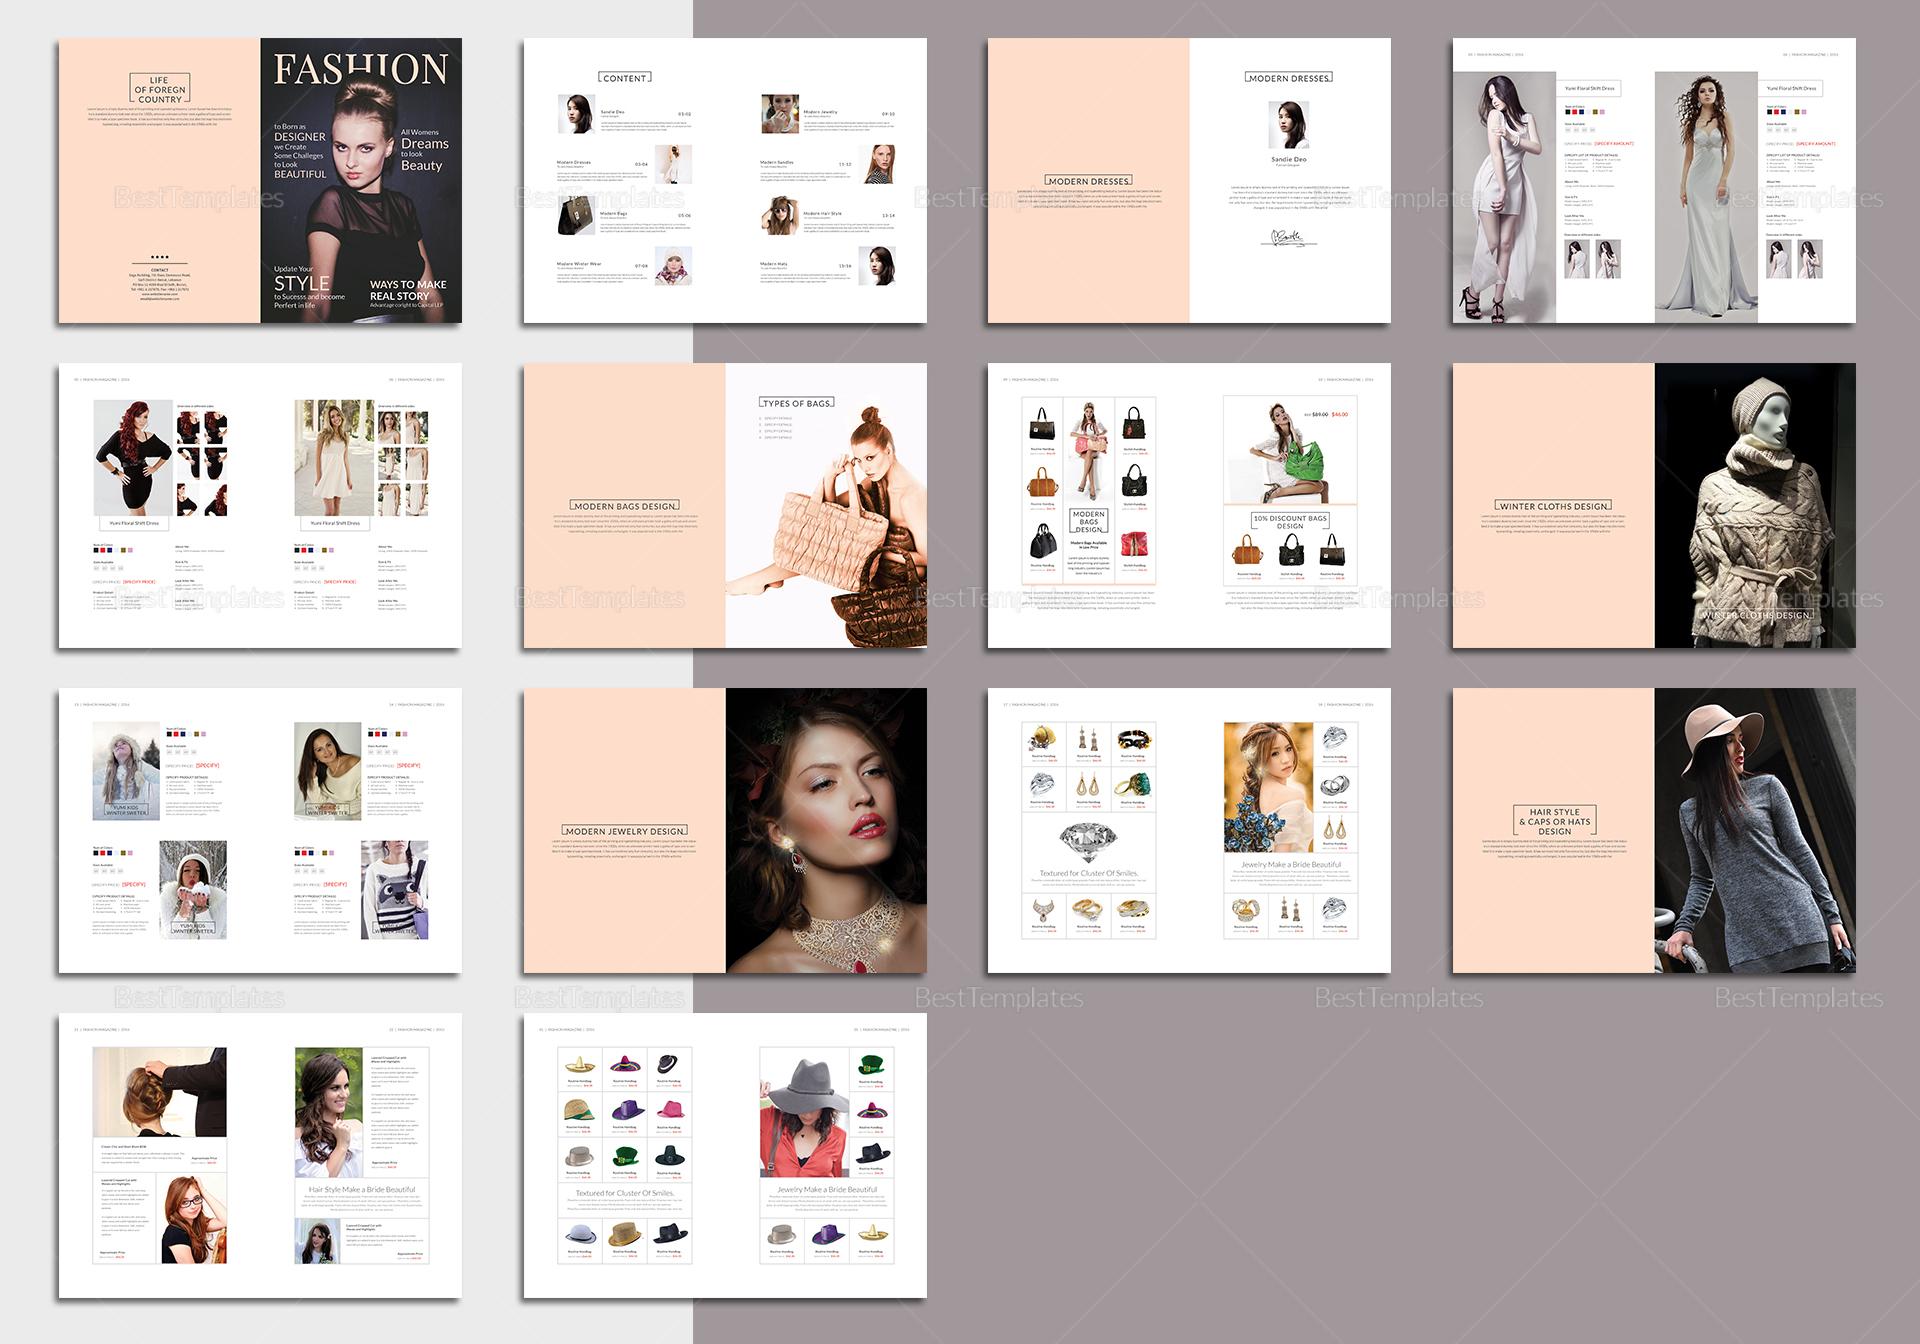 43 Best Fashion Blog Magazine WordPress Themes 2018 - colorlib Fashion magazine style blogger template